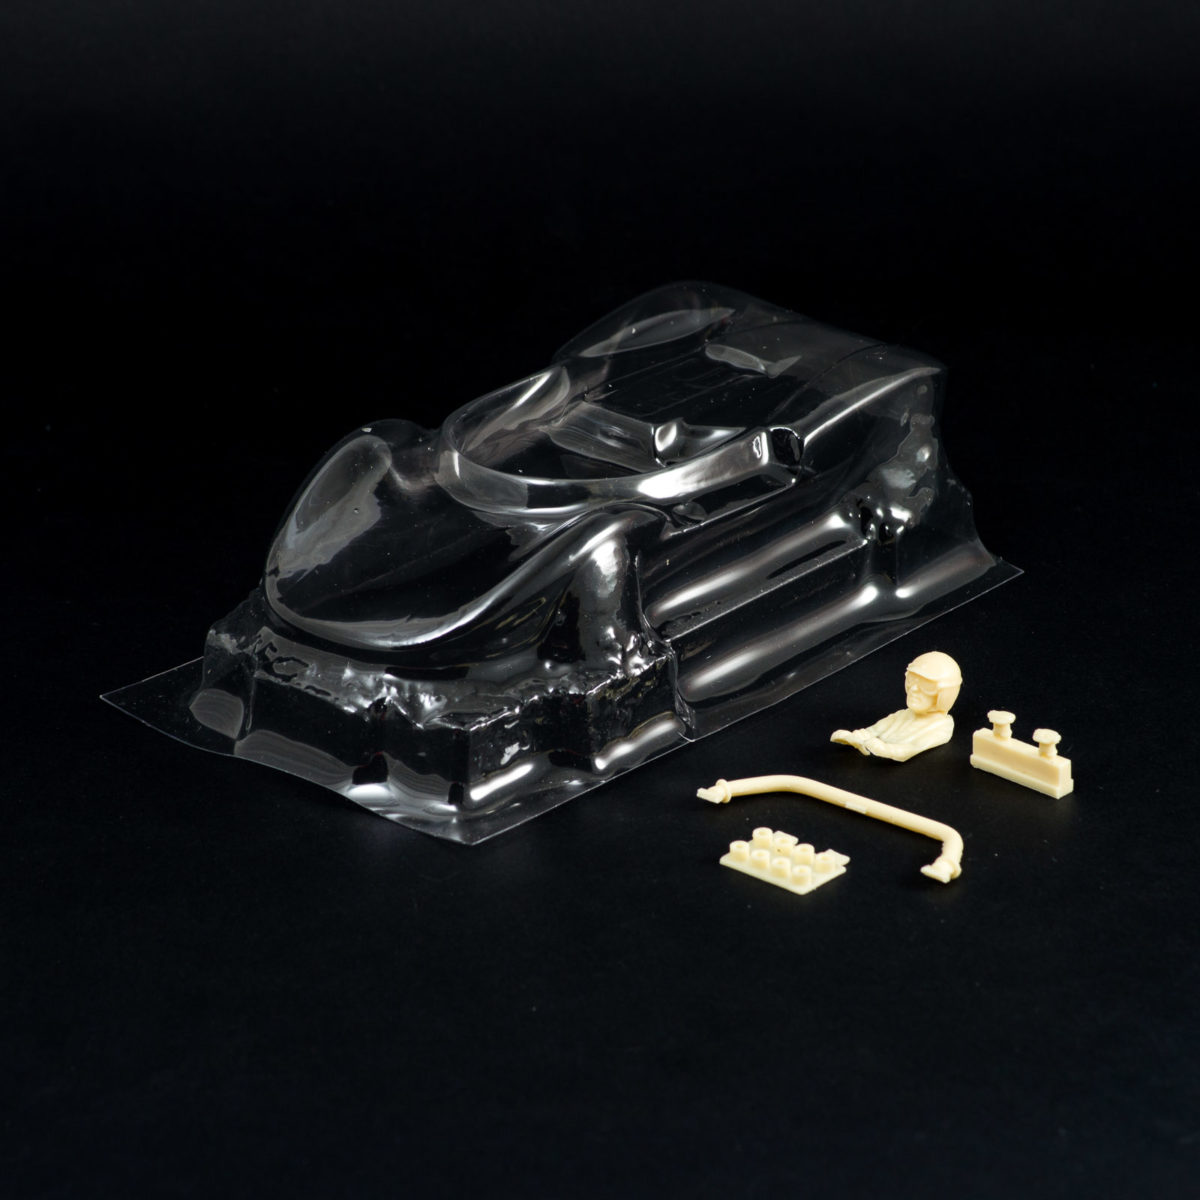 Carrozzeria Slot Car Cucaracha 1/24 Trasparente Replica COX